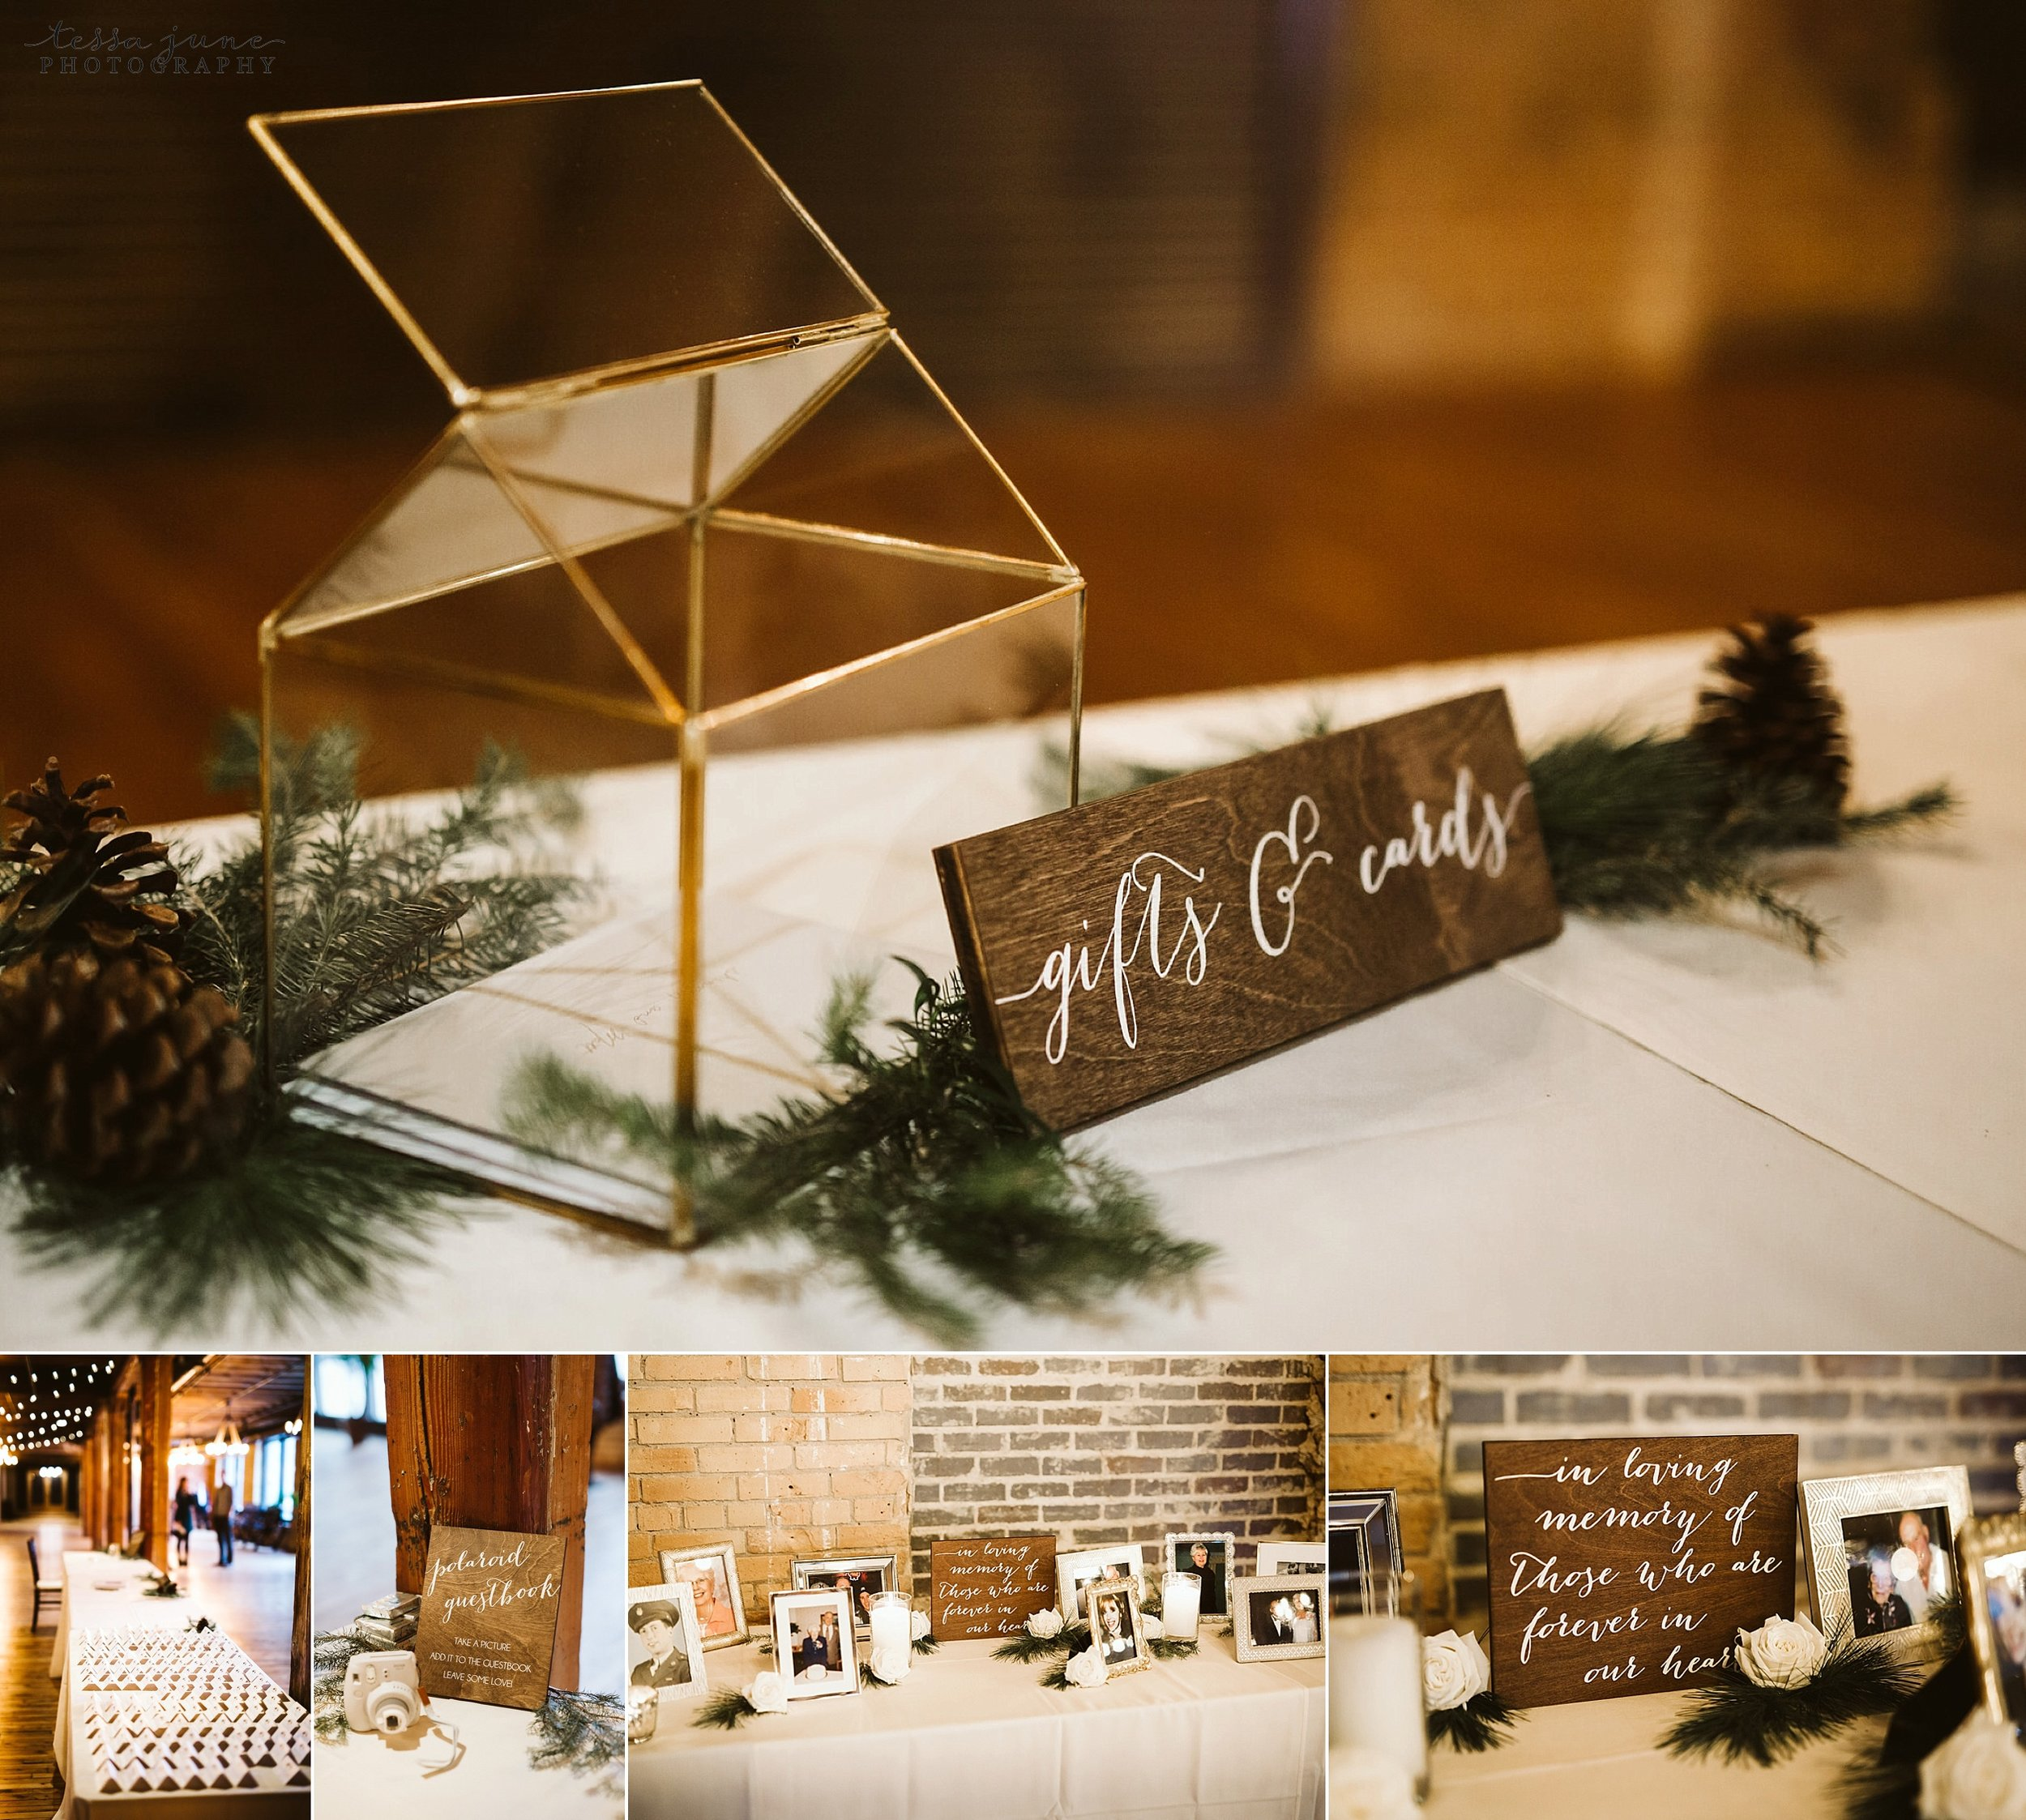 minneapolis-event-center-winter-romantic-snow-wedding-december-137.jpg